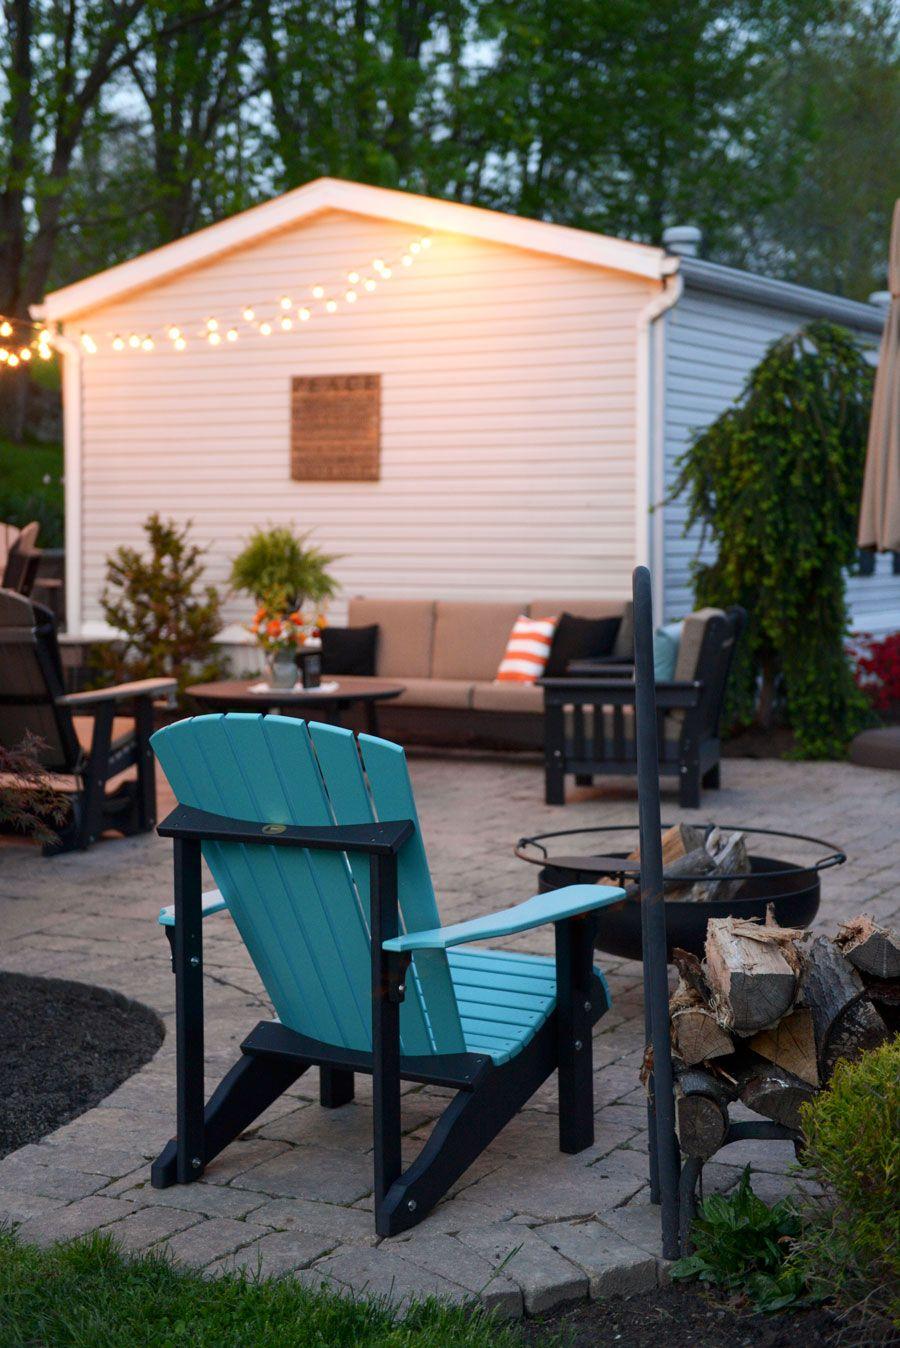 Poly Aruba Blue And Black Adirondack Chair Around A Fire